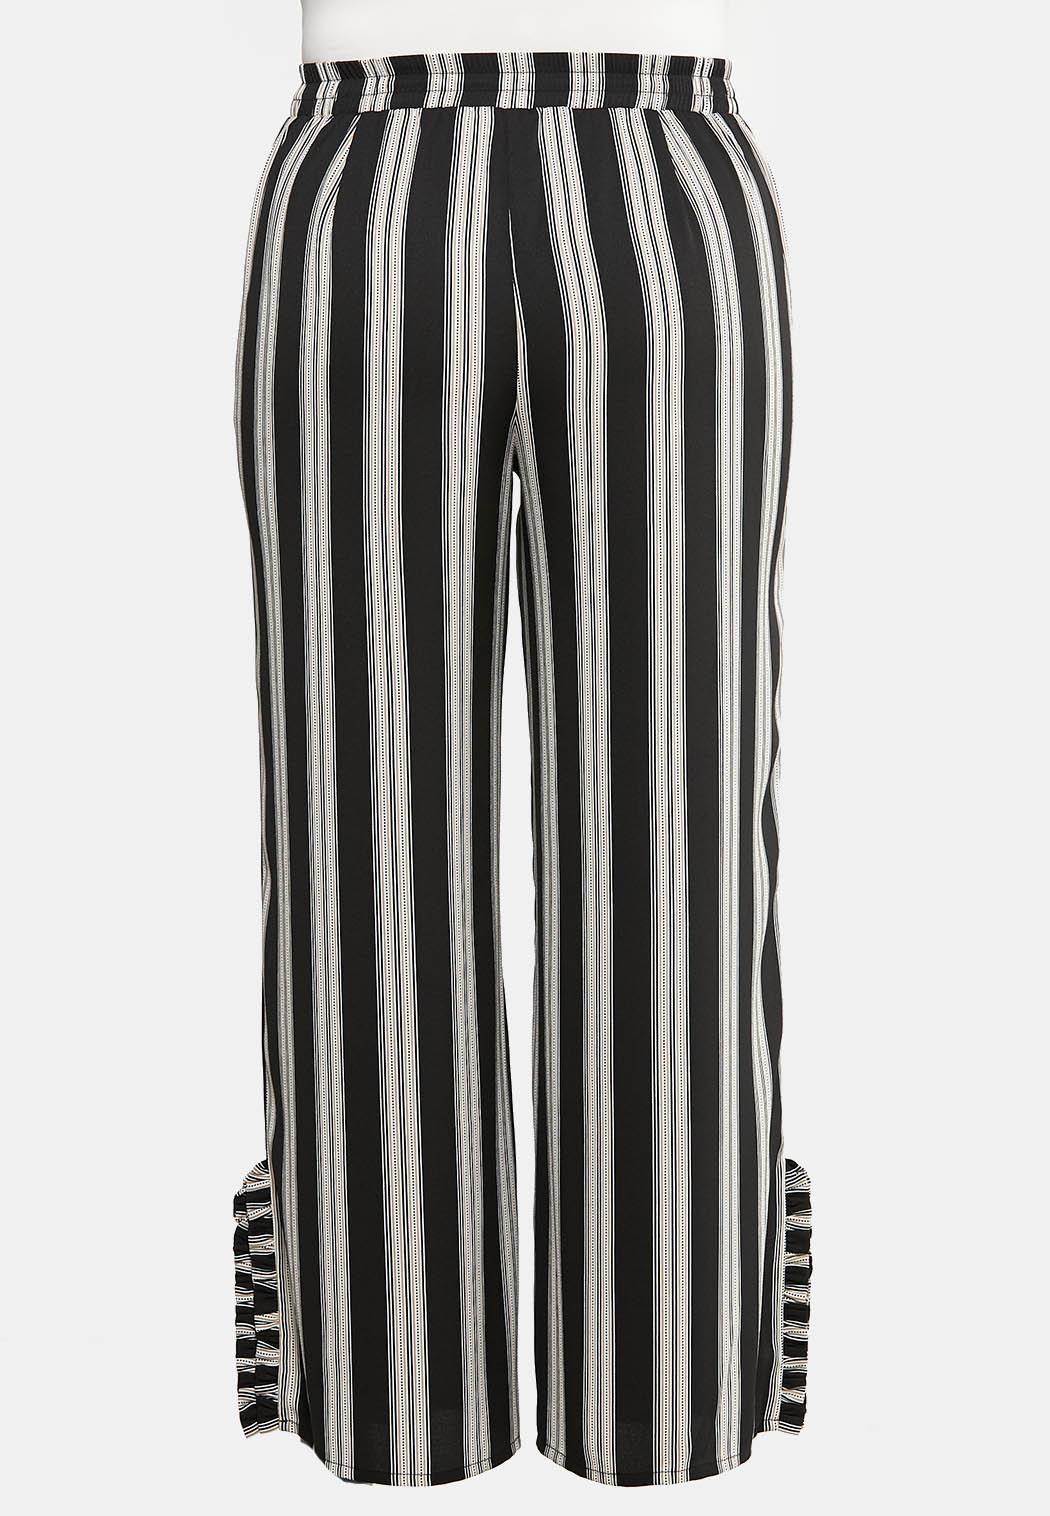 742fec2ce4a1c9 Plus Size Ruffle Hem Printed Palazzo Pants Pants Cato Fashions